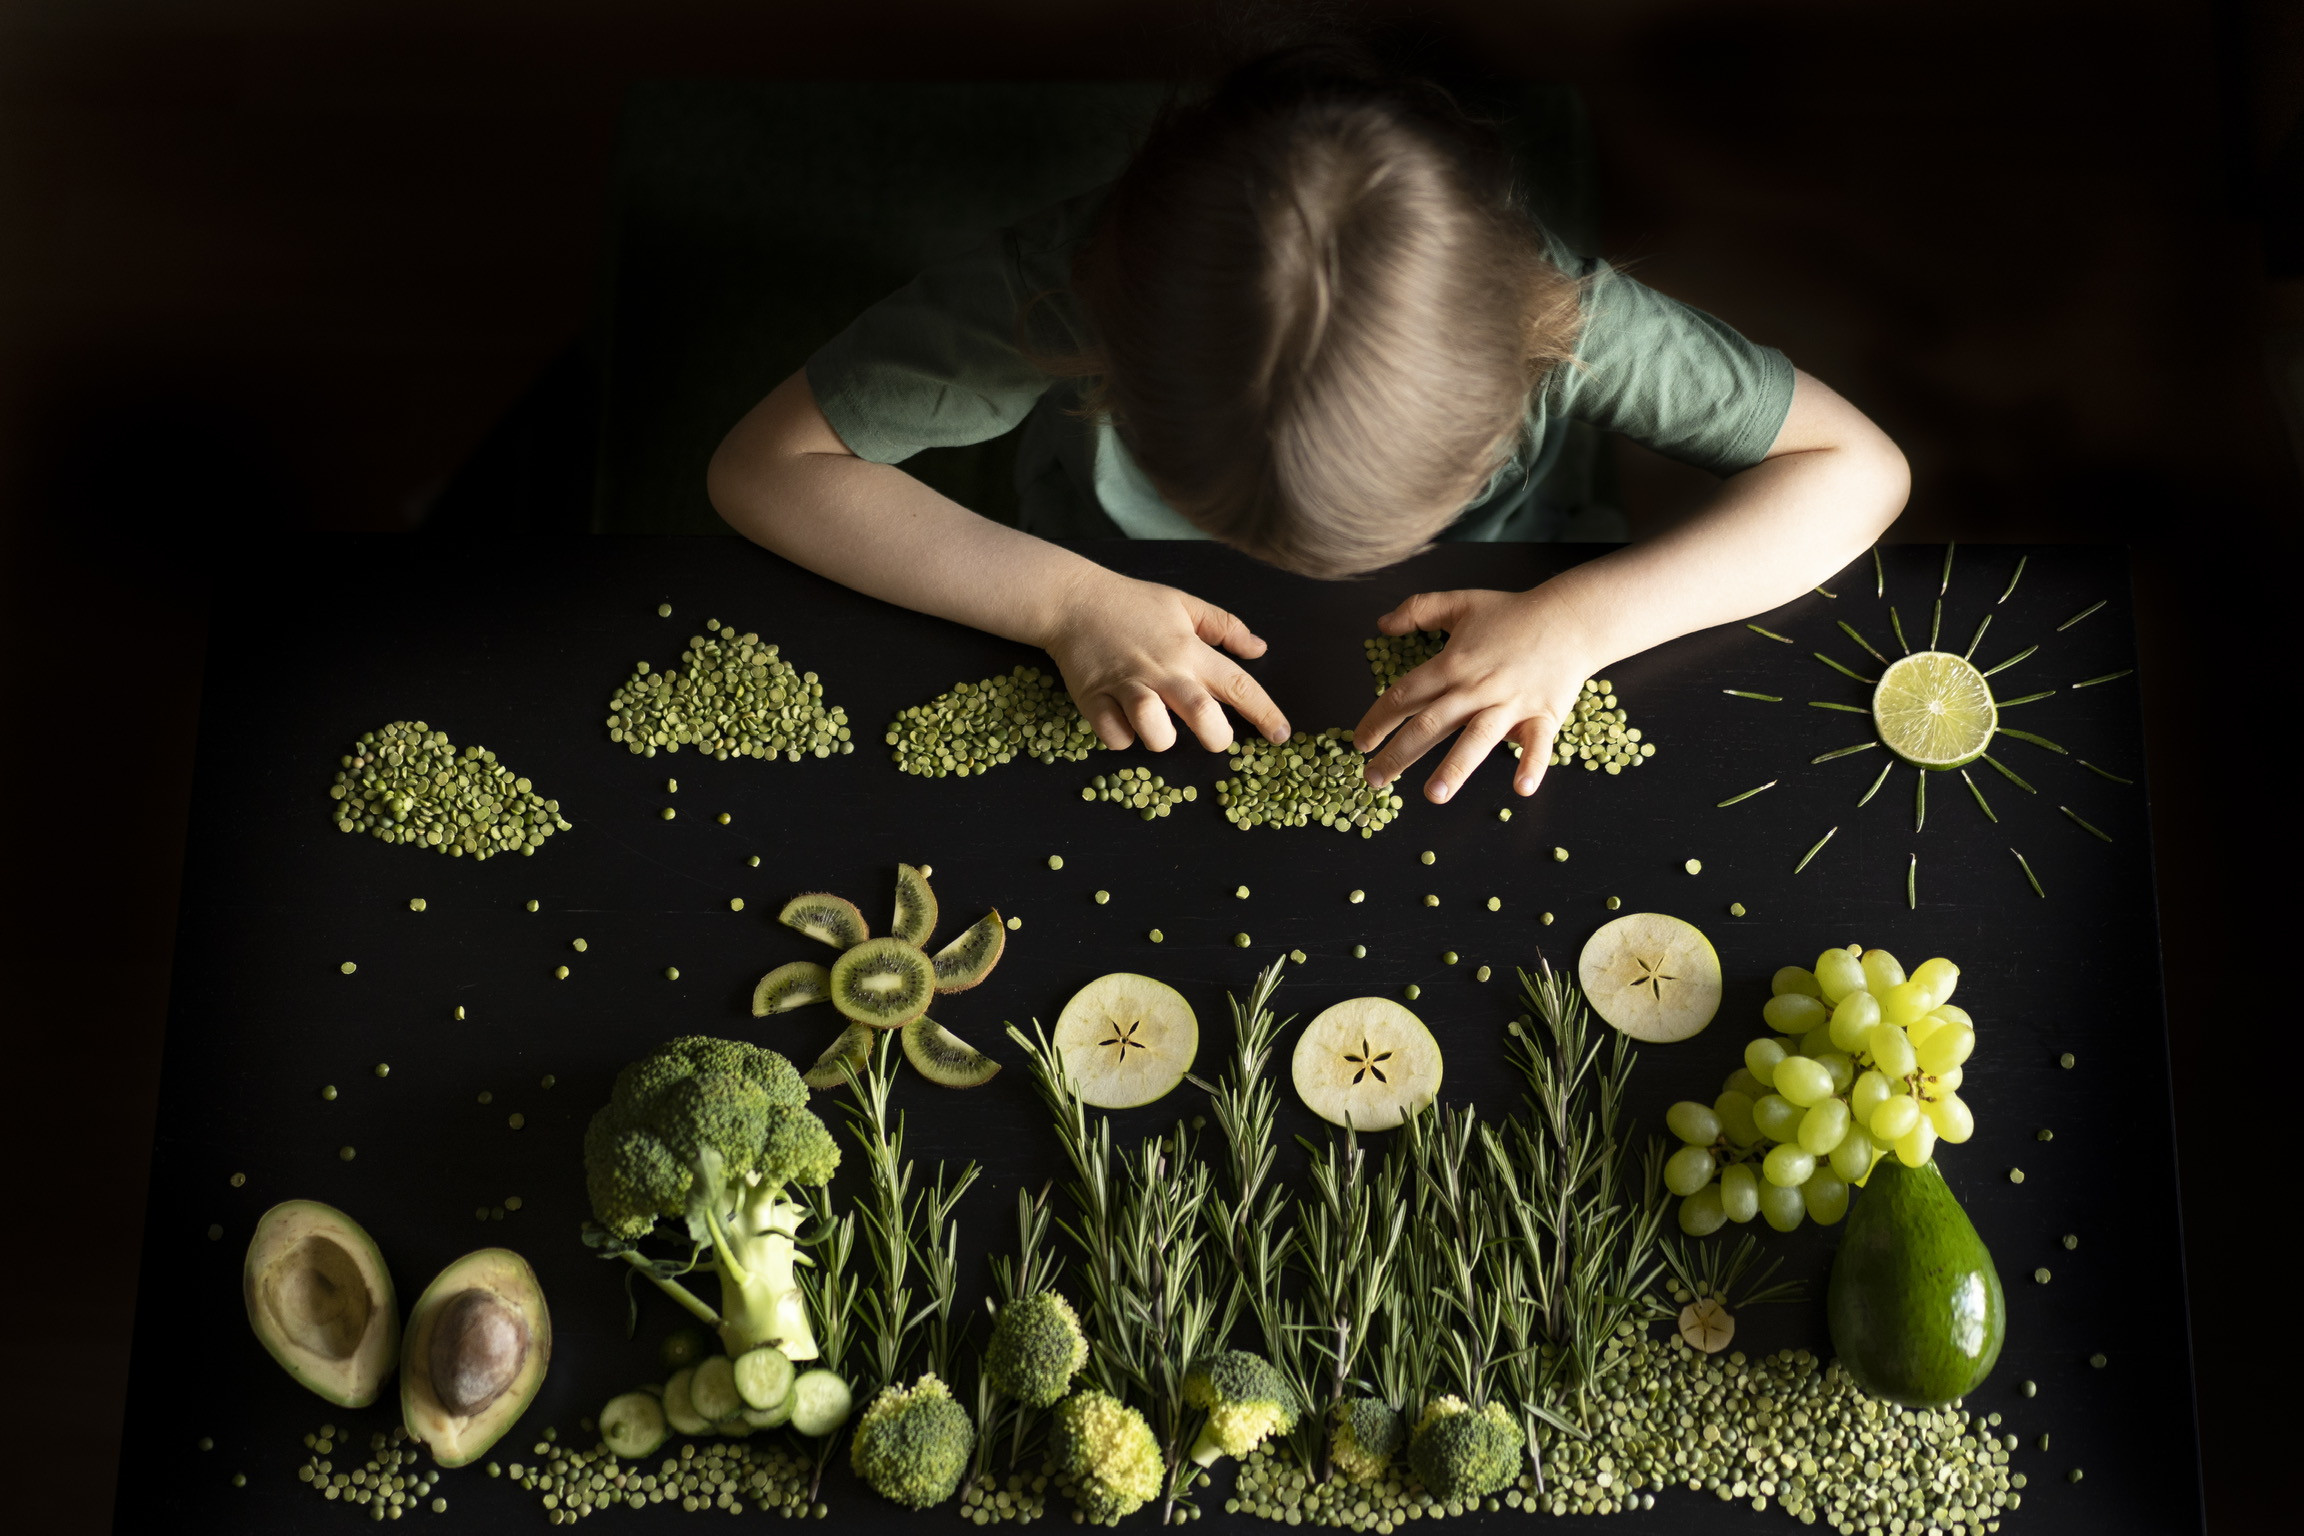 Зелёная еда, зелёный мир